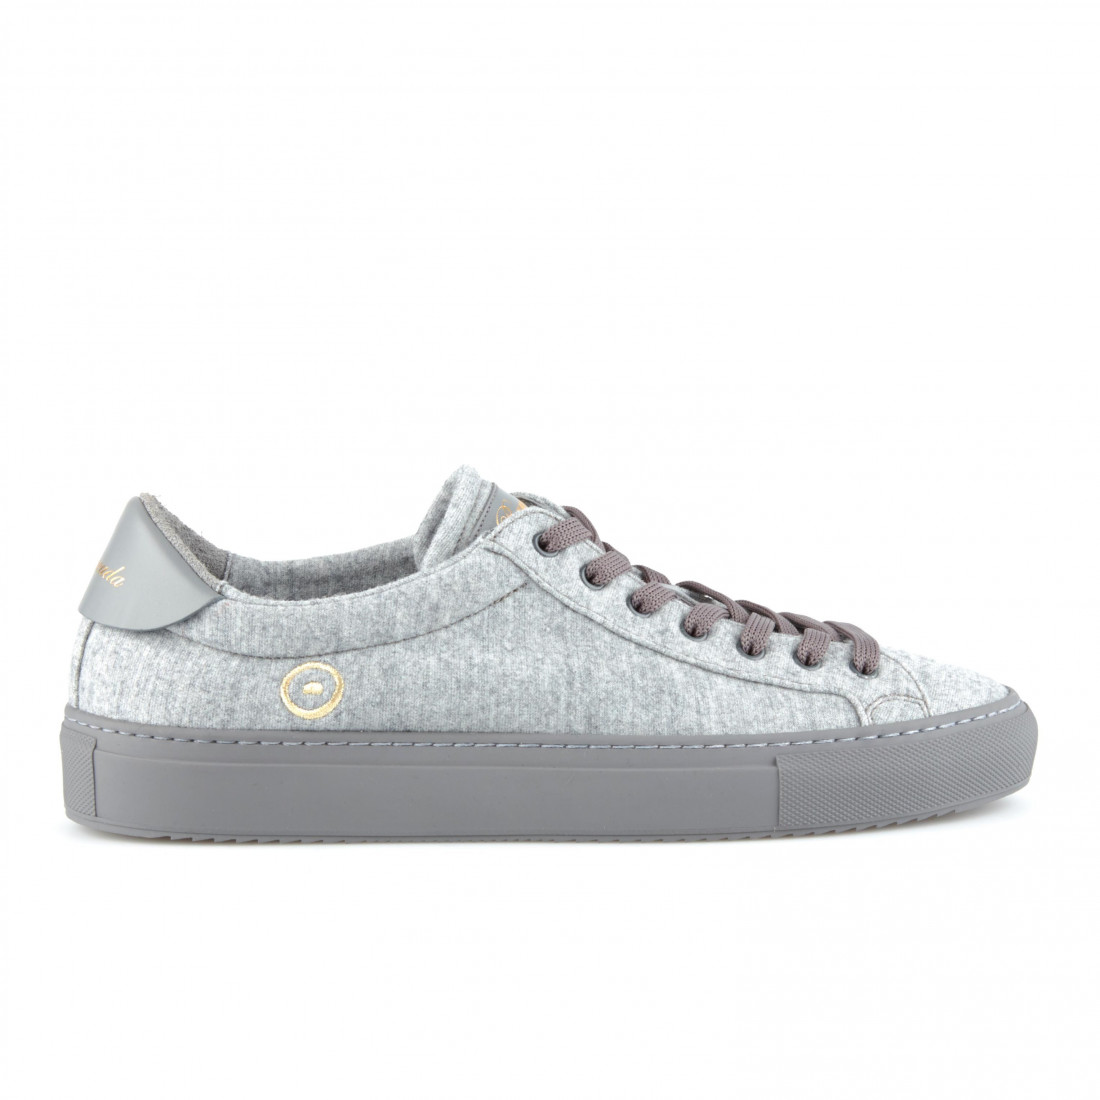 sneakers uomo barracuda bu2997a00osate6700 3446